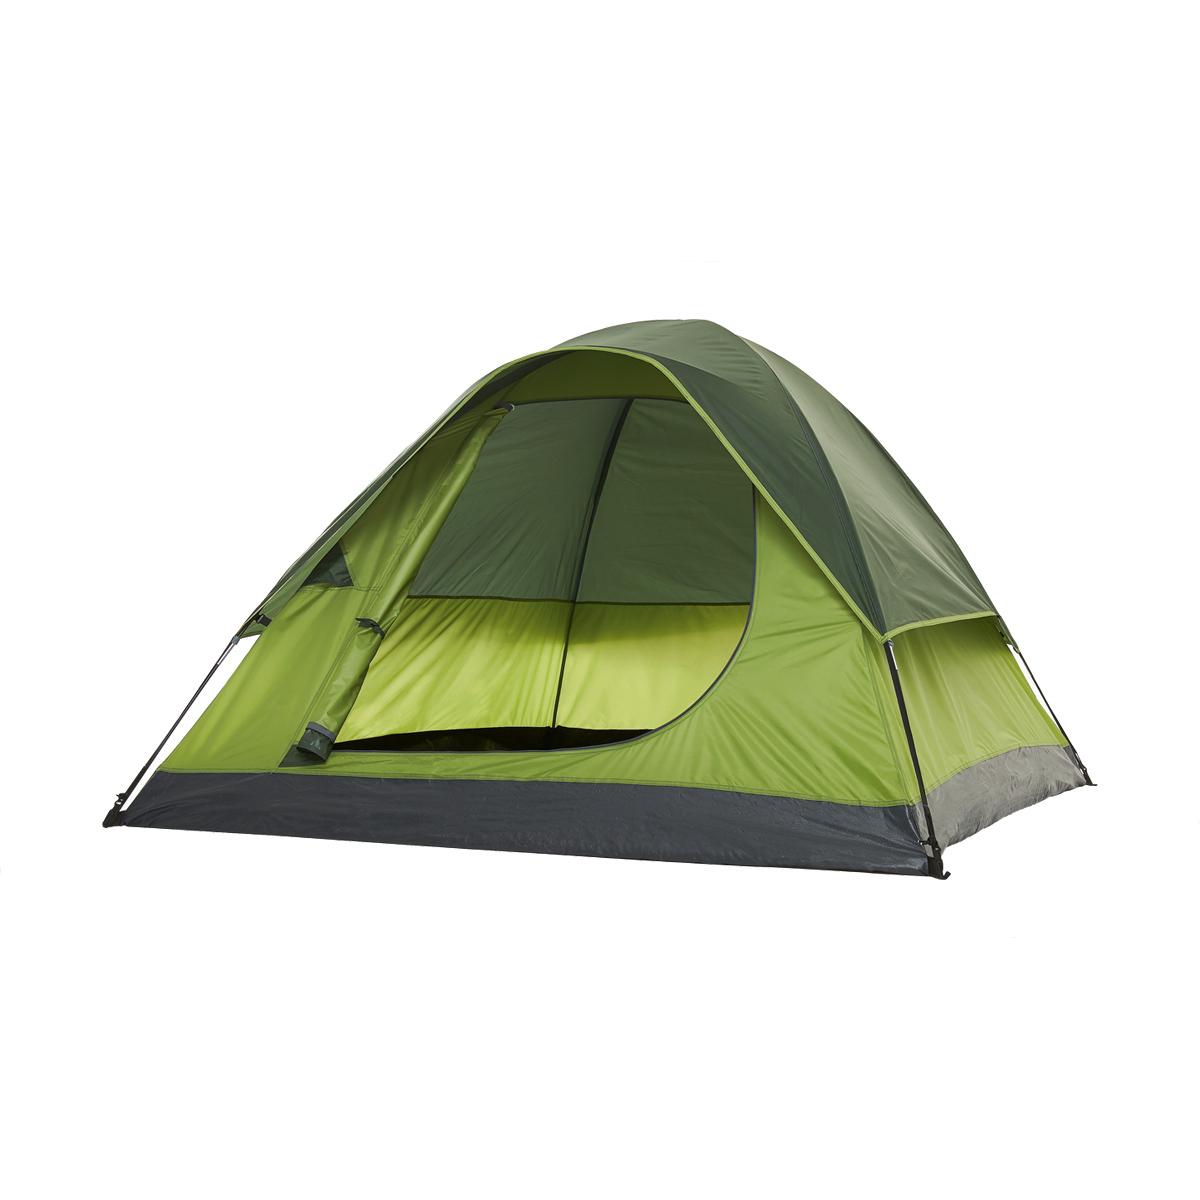 3 Person Dome Tent Kmart